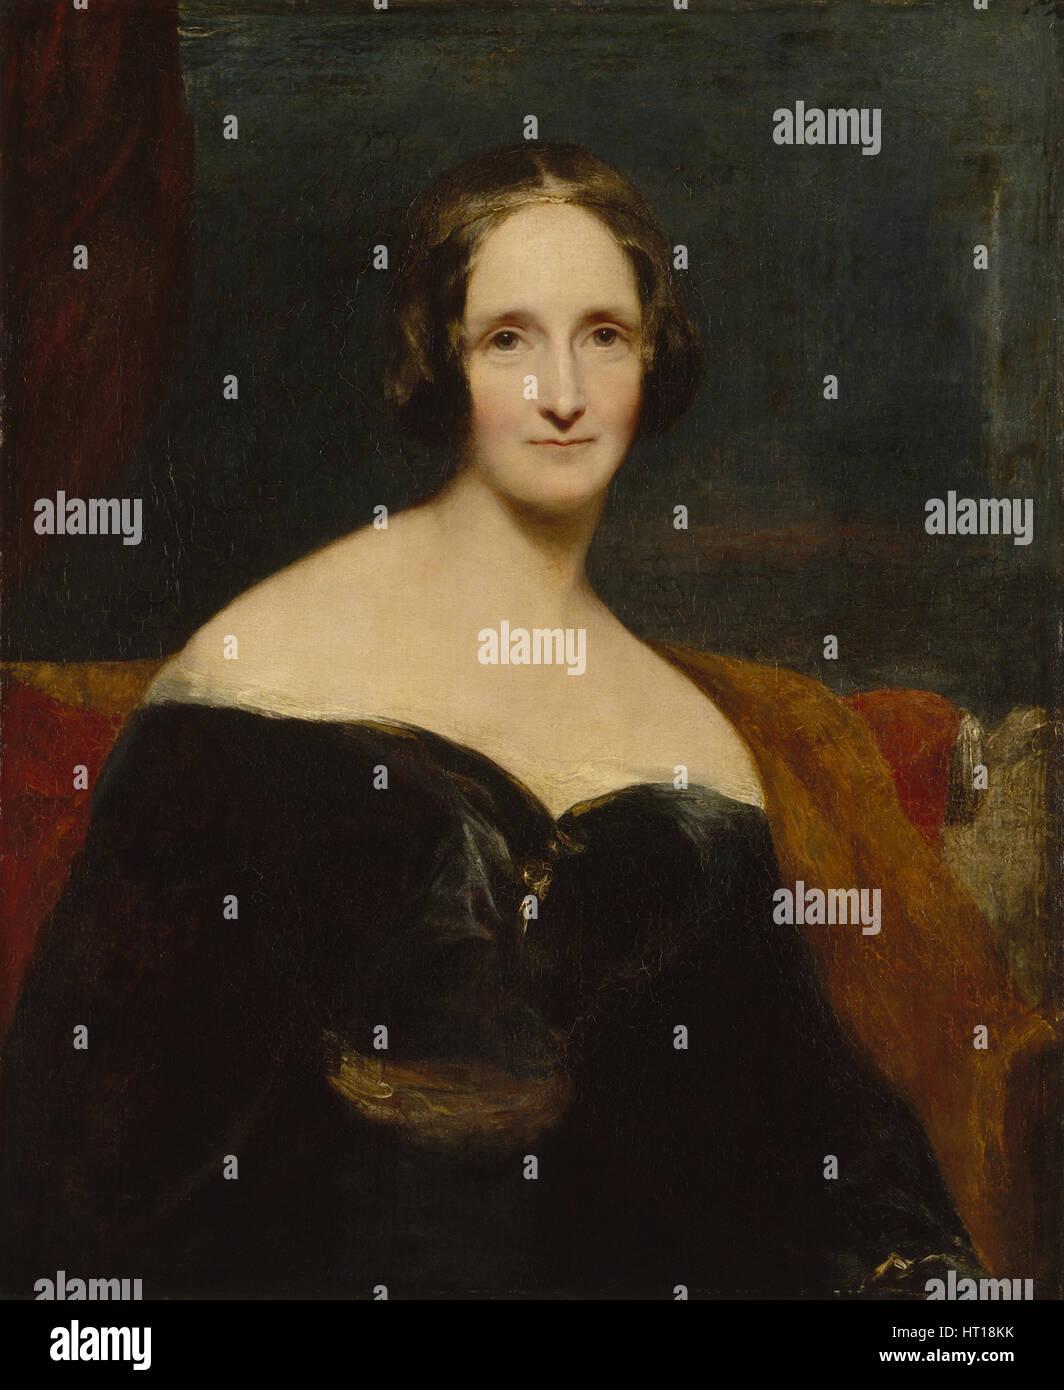 Mary Shelley, 1840. Artist: Rothwell, Richard (1800-1868) - Stock Image